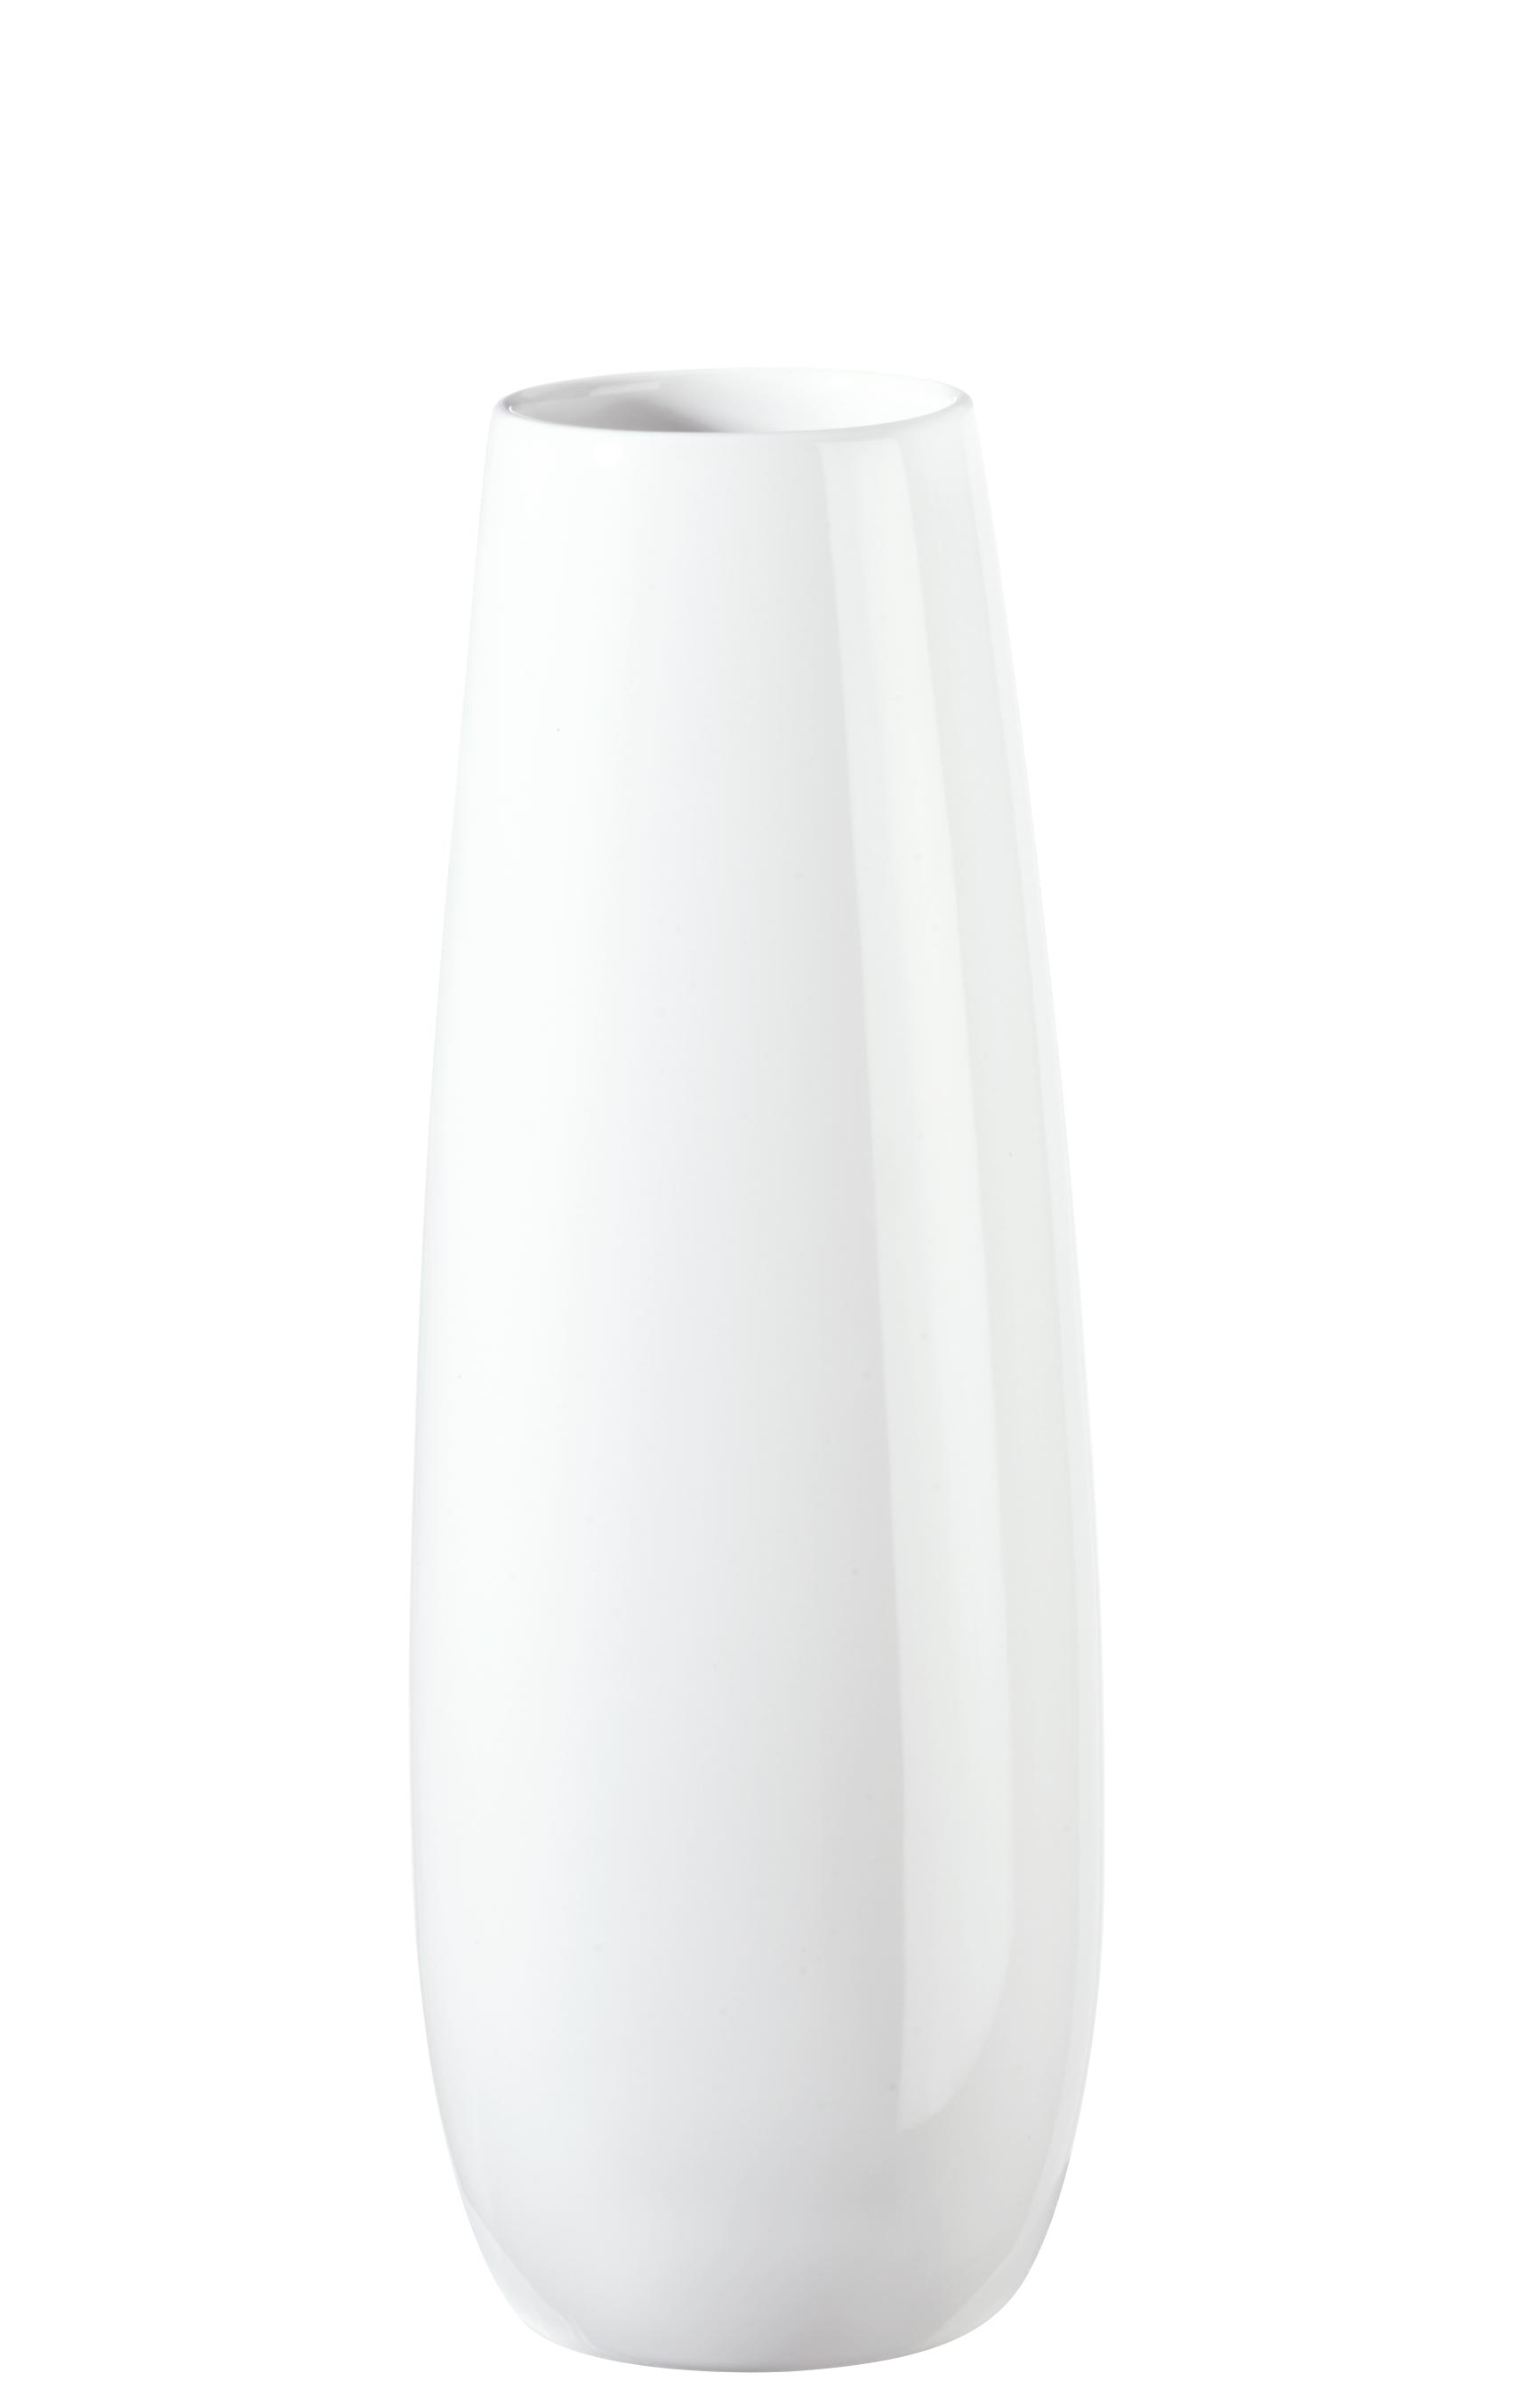 vase wei bodenvasen vasen bert pfe produkte home by asa die asa selection wohnwelten. Black Bedroom Furniture Sets. Home Design Ideas